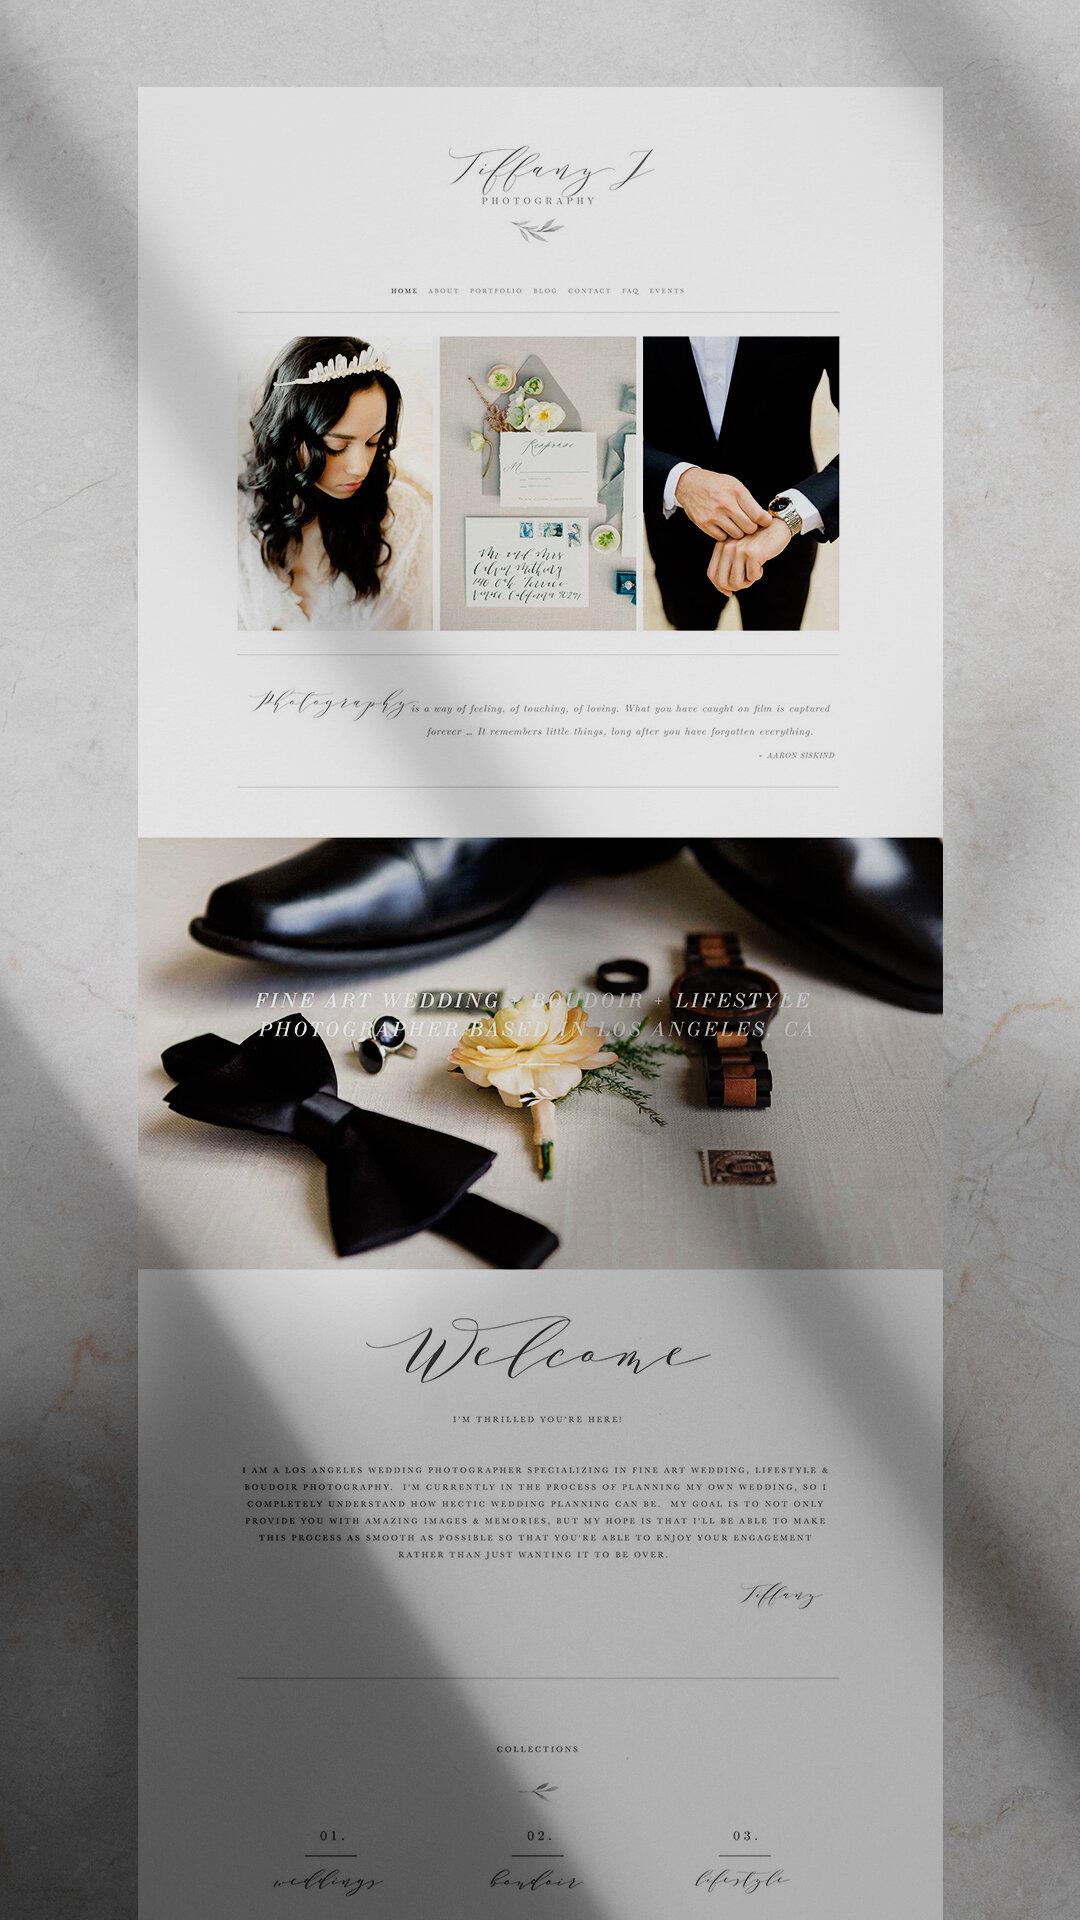 Photographer Squarespace Design: Tiffany Gentry